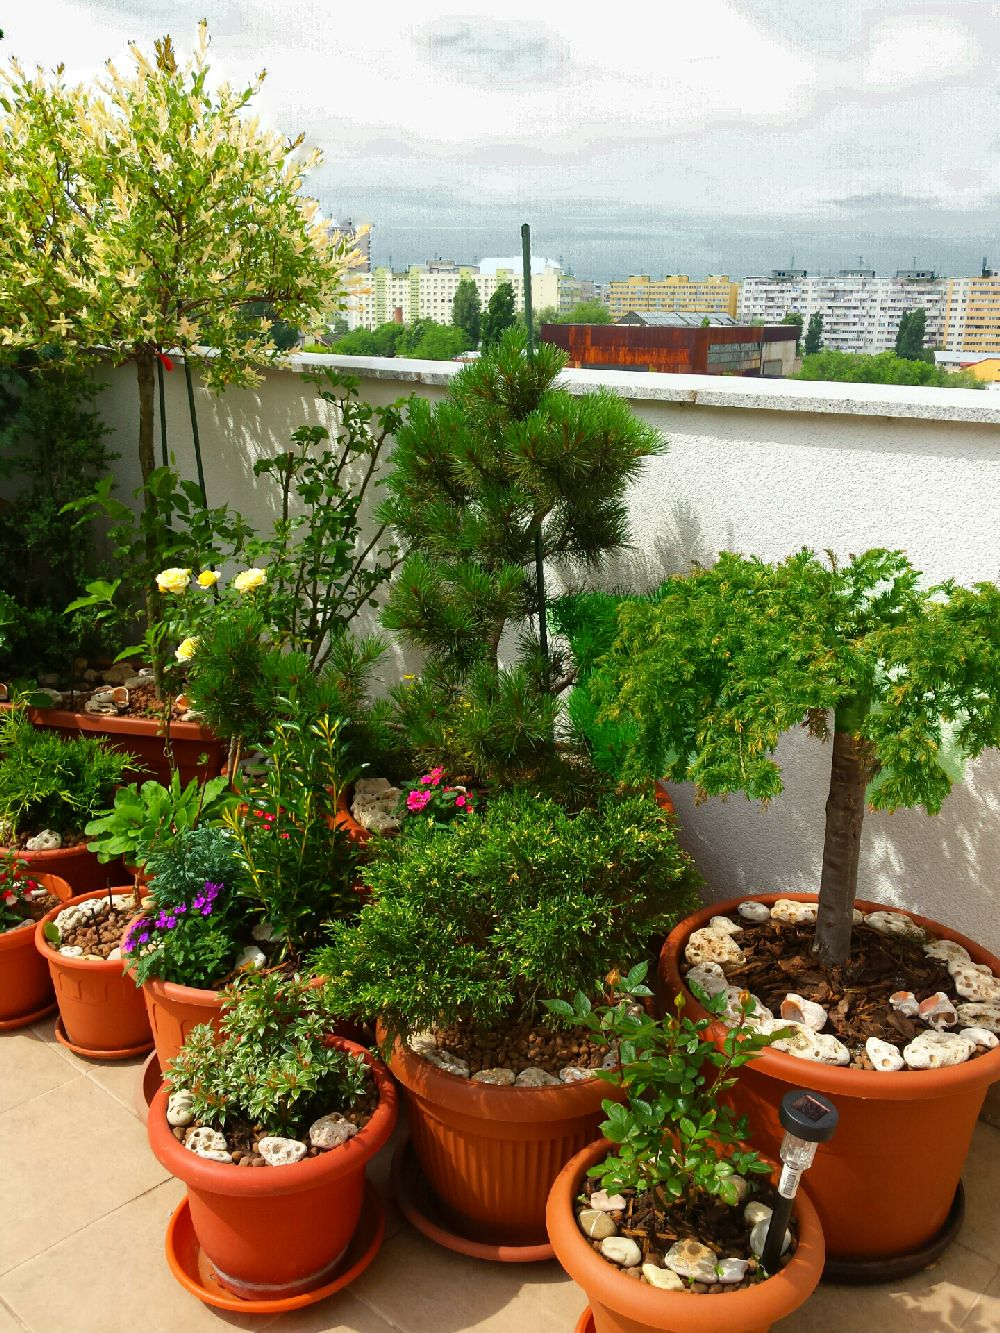 adelaparvu.com despre gradina pe terasa blocului, text Carli Marian, Foto Carli Marian (1)